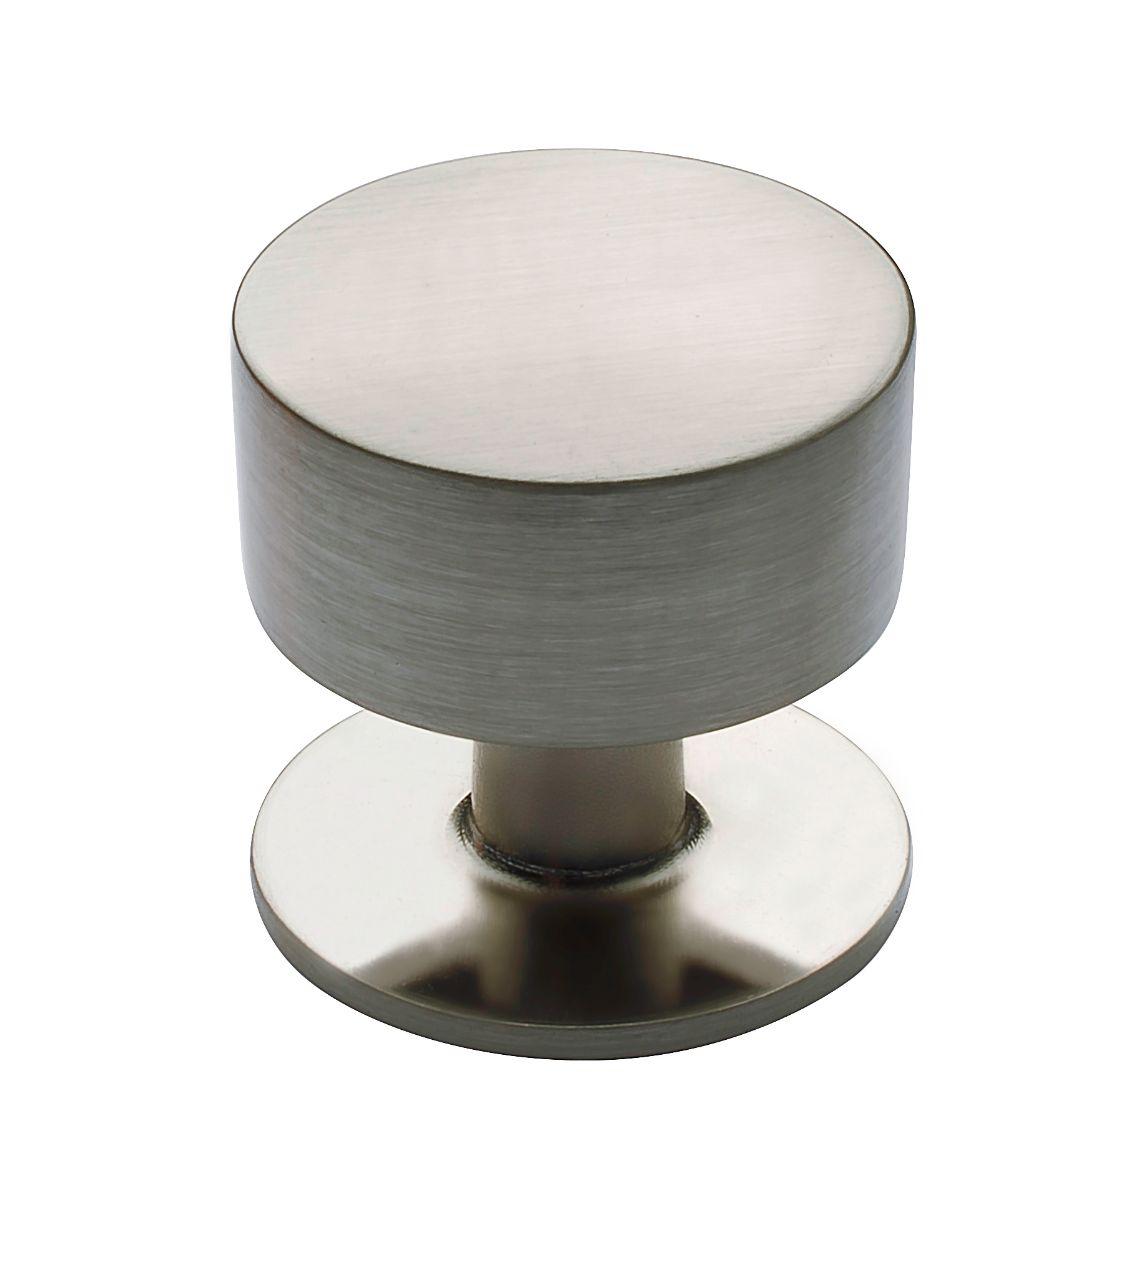 BARCELONA Bi-Fold/Cabinet Knob - Satin Nickel